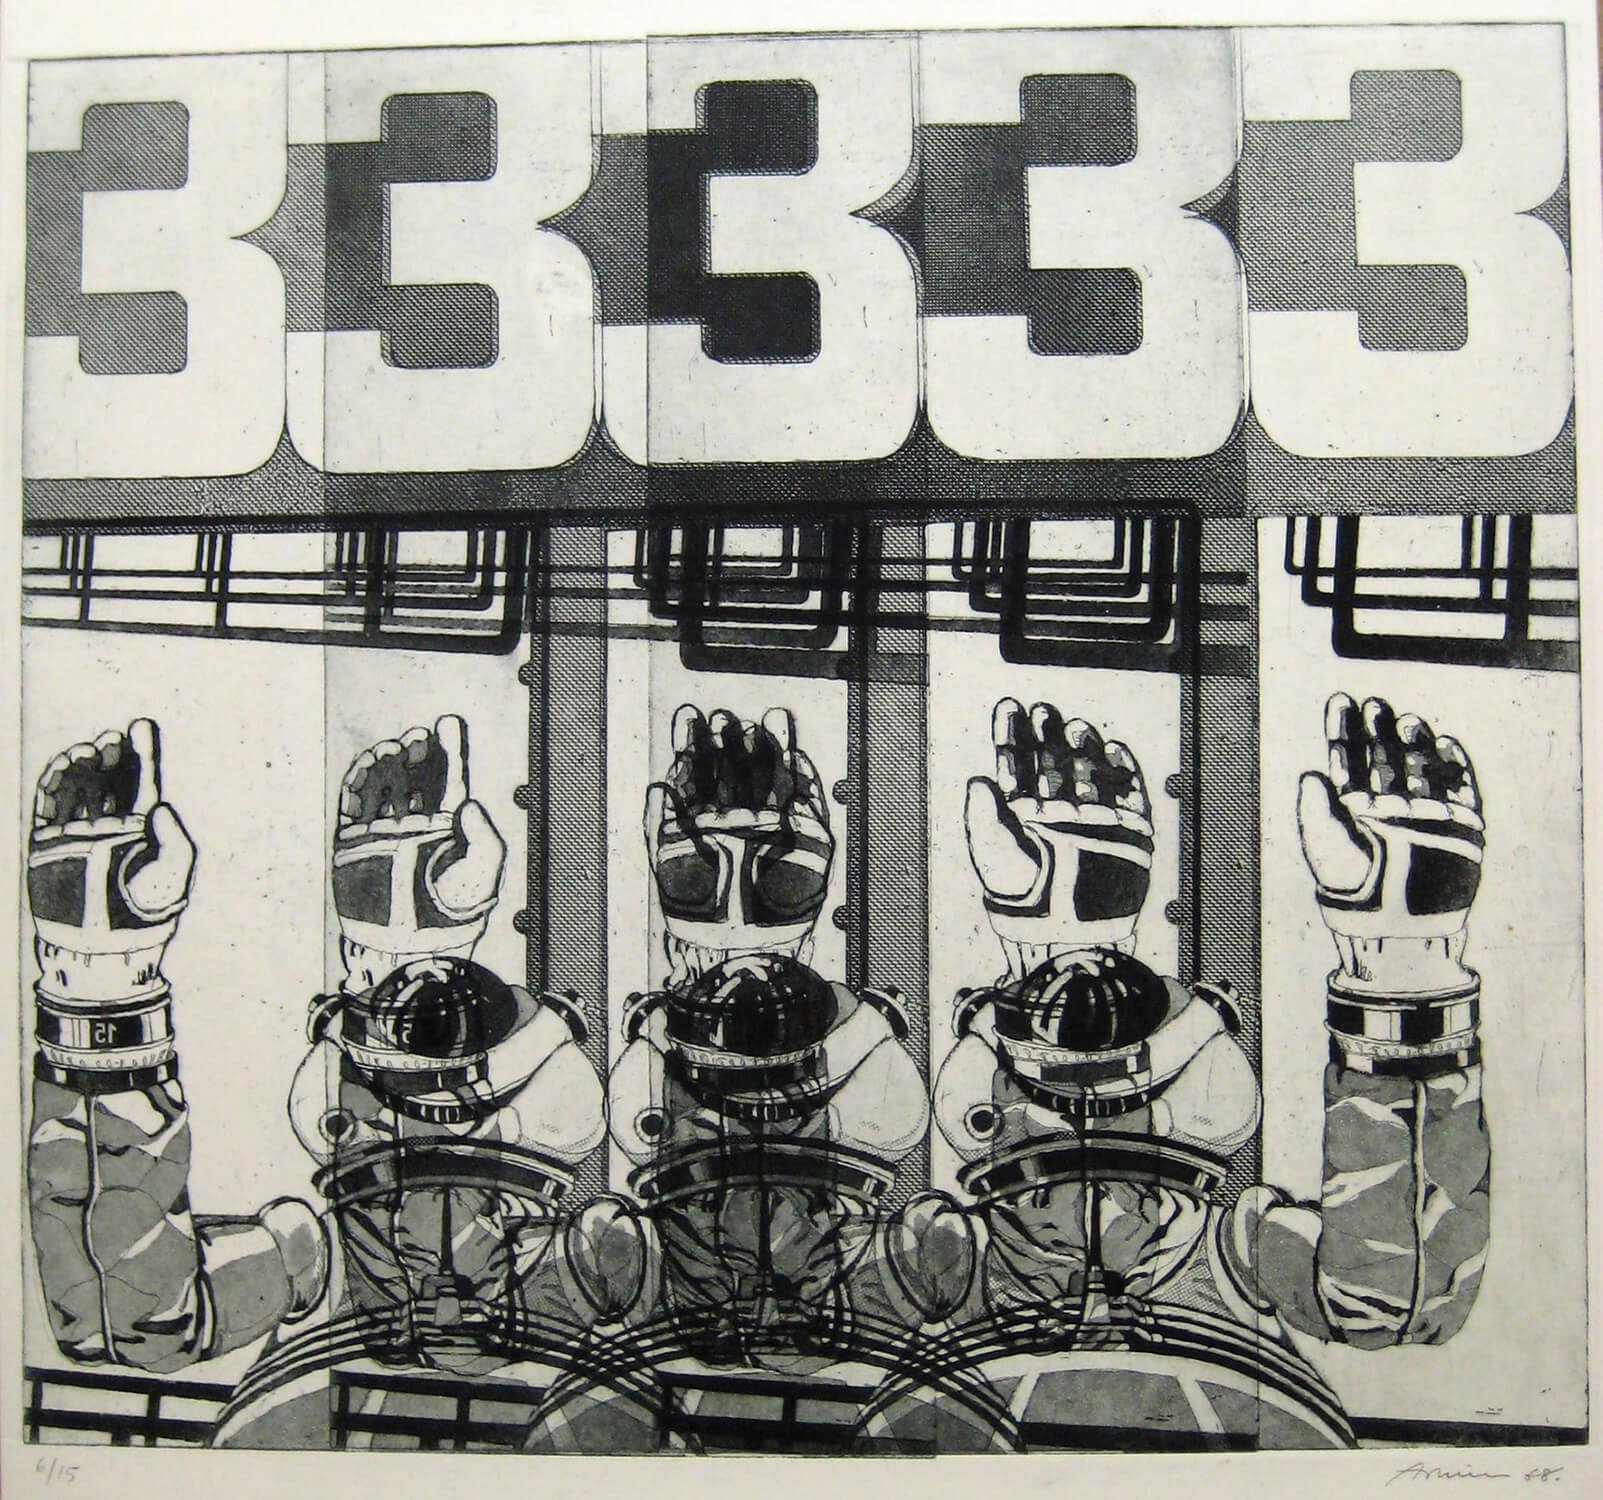 Arnim_Edition Hake three_1968